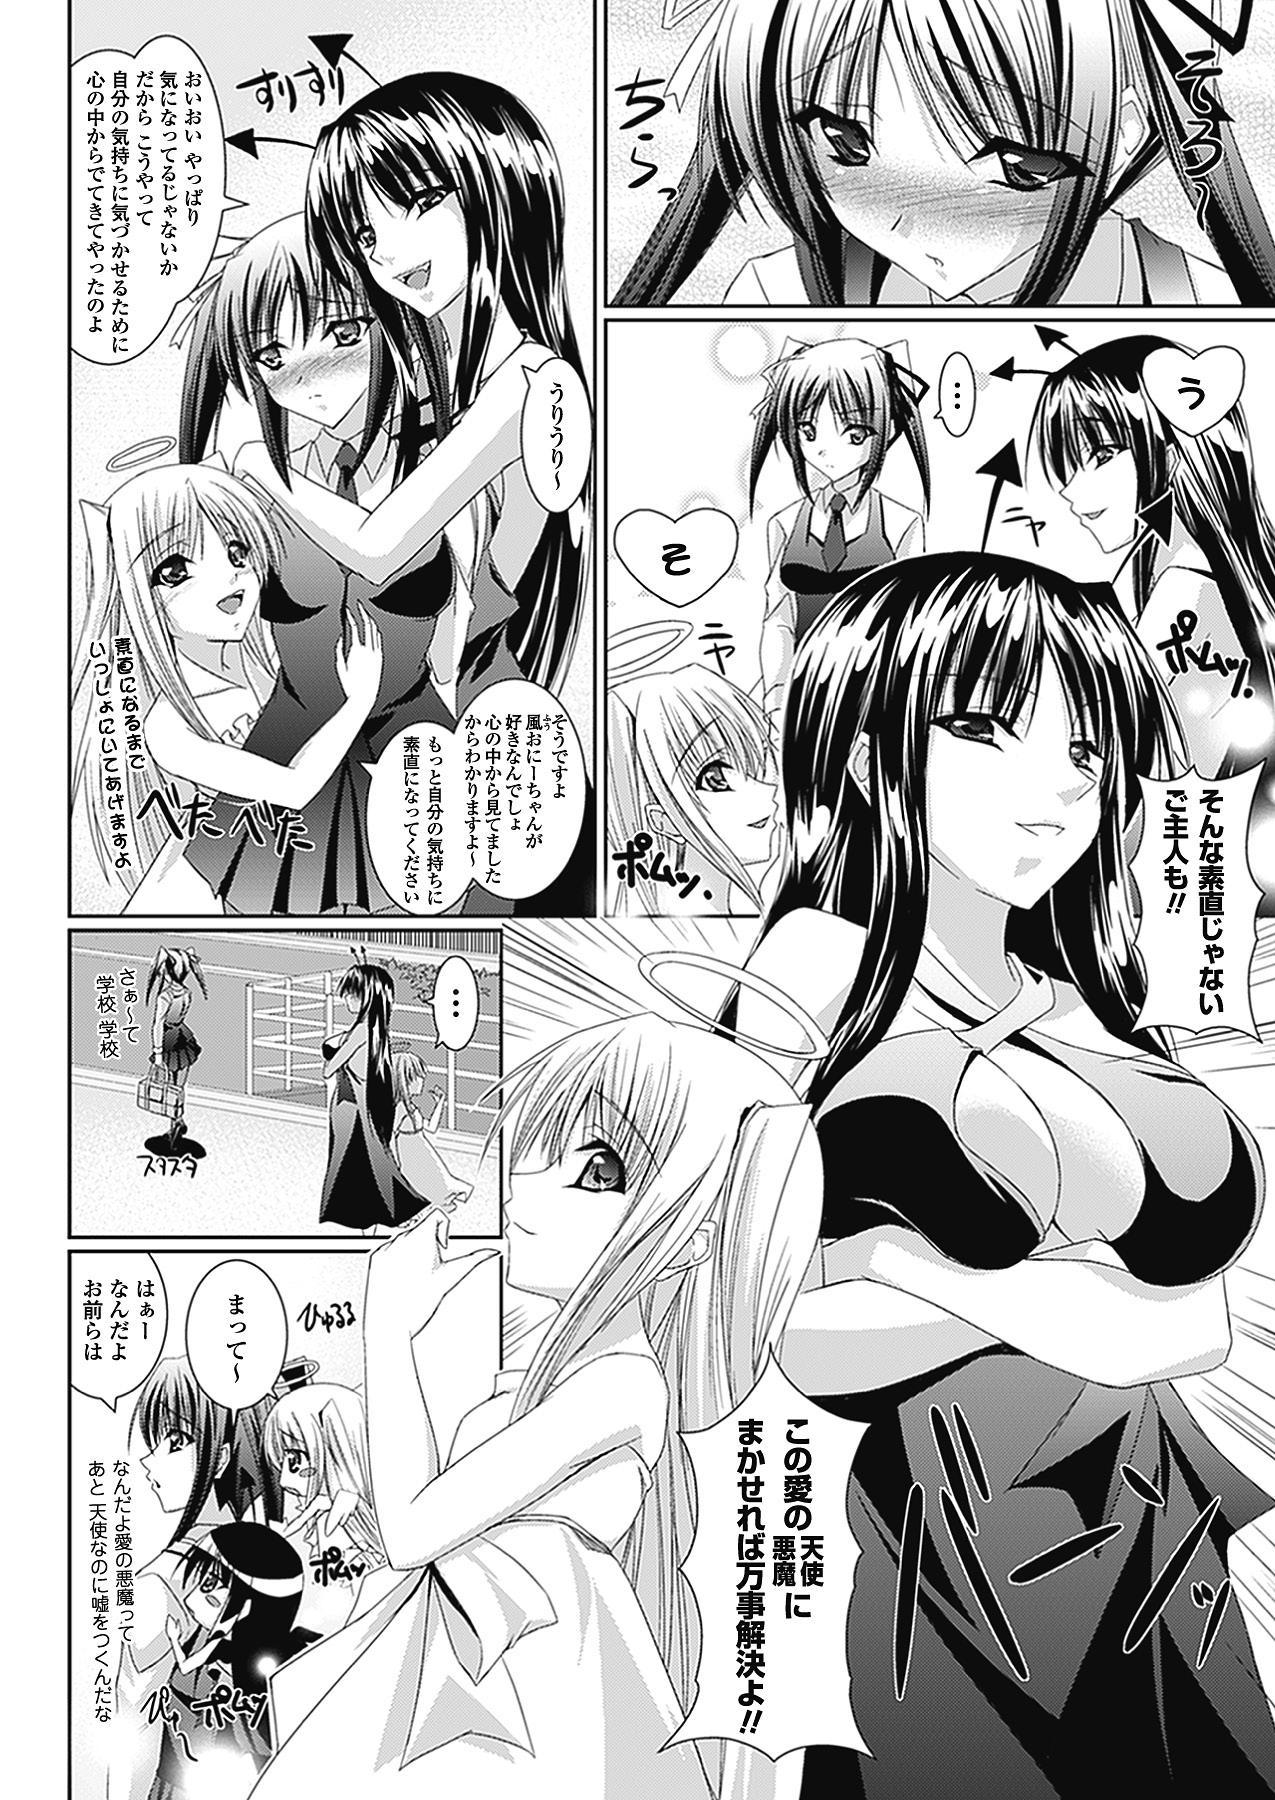 Amai Kuchibiru Torokeru Kuchibiru 137